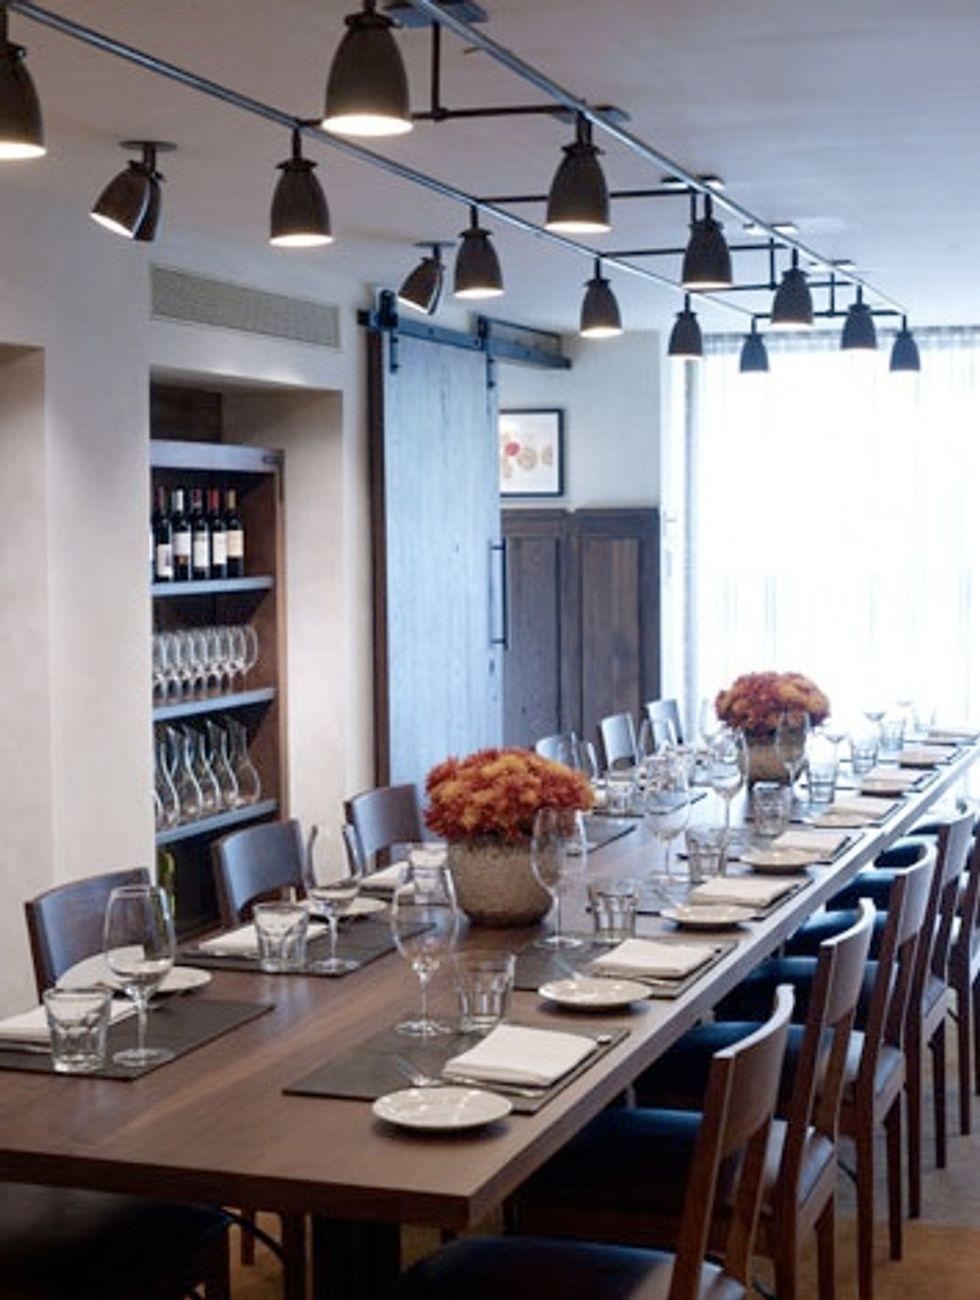 Restaurant of the Week: Maialino